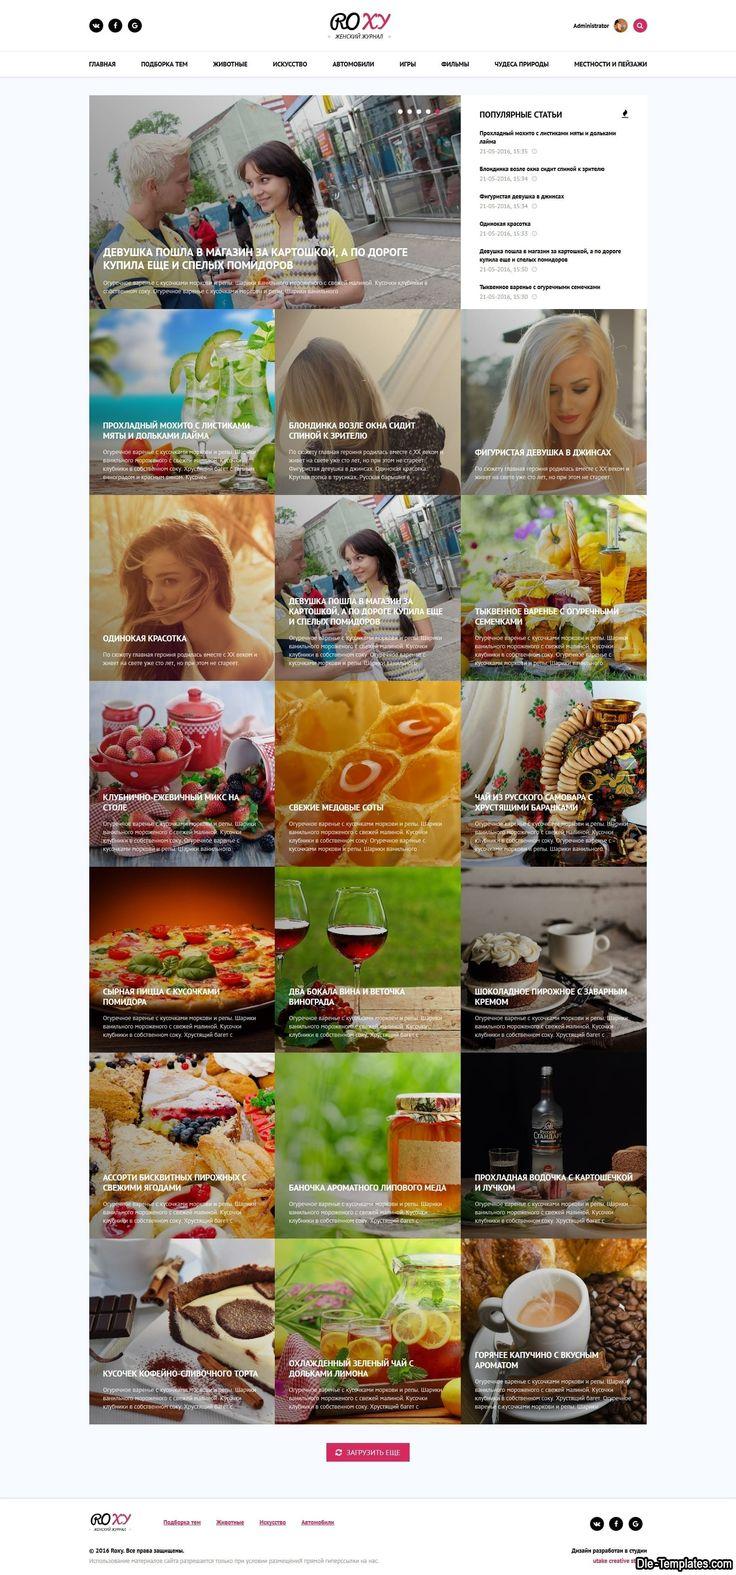 Roxy - адаптивный журнальный шаблон для DLE #templates #website #шаблон #сайт #web